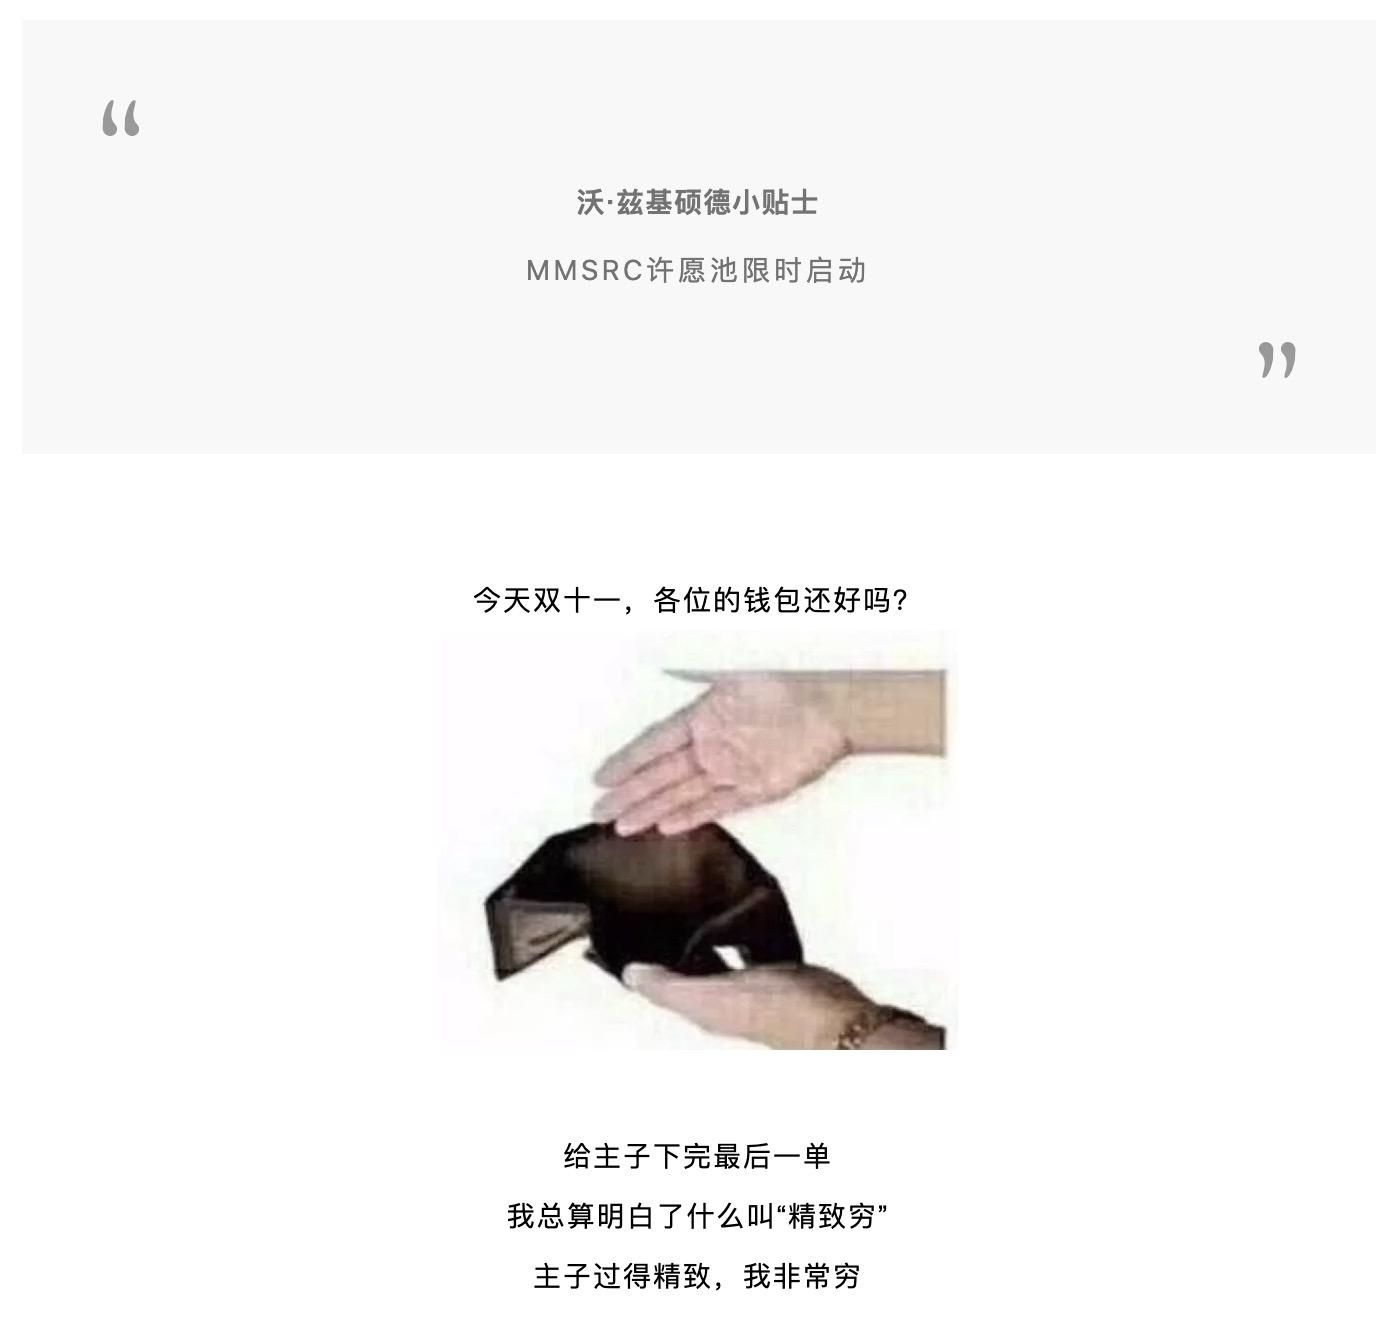 https://momo-mmsrc.oss-cn-hangzhou.aliyuncs.com/img-670e8b43-1356-38d0-9309-bc7b013f755e.jpeg